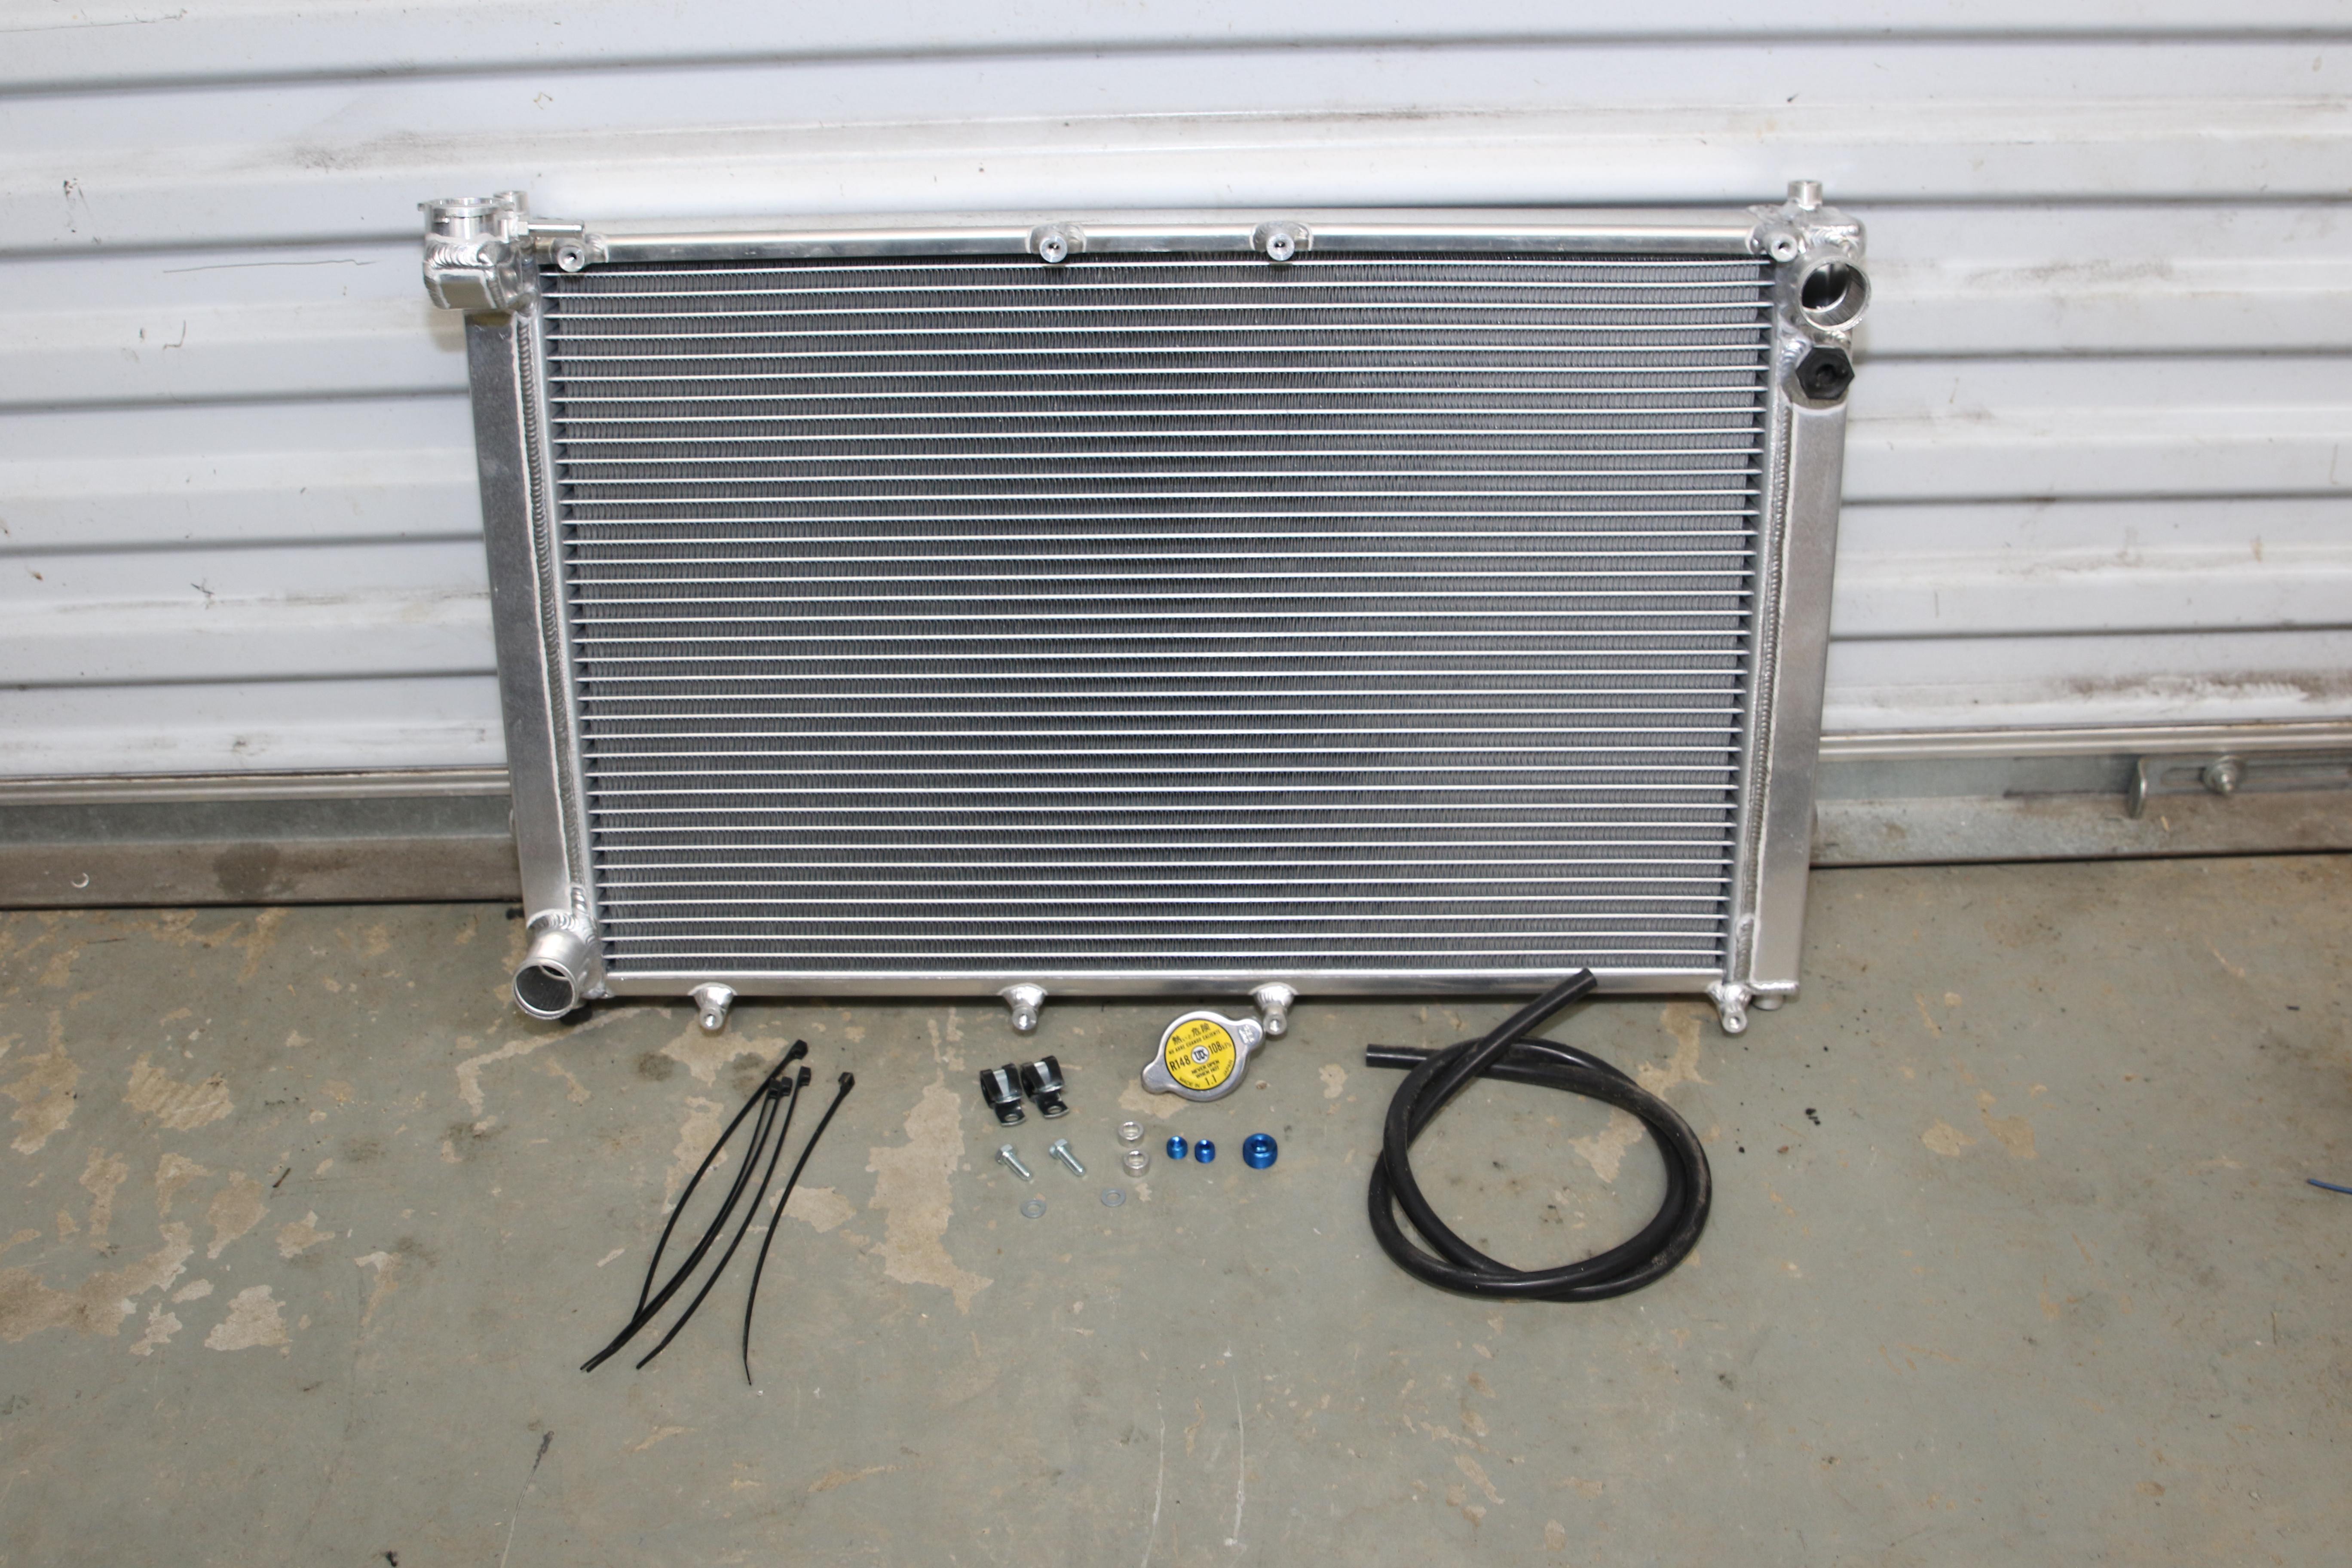 Project Turbo Miata: Engine Number 4 | Mazda Miata | Project